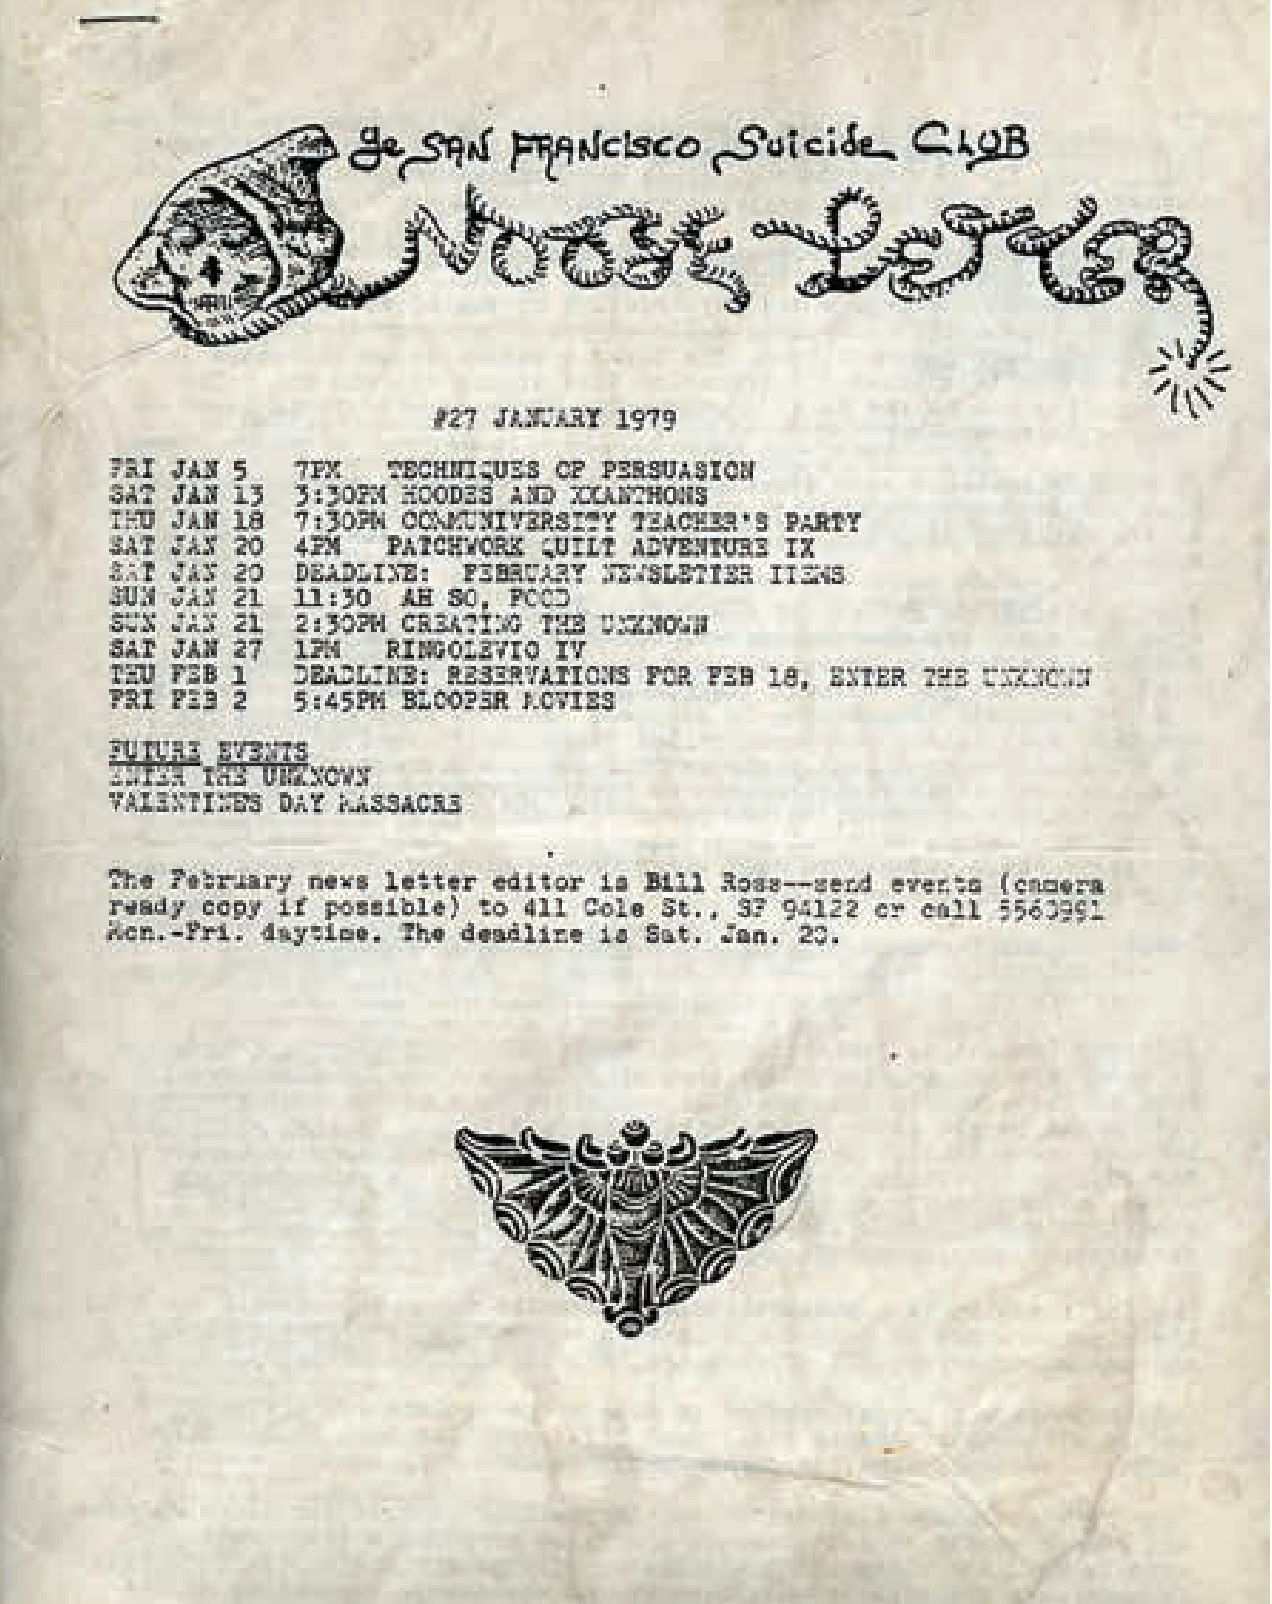 Visit the Suicide Club Website Archive -